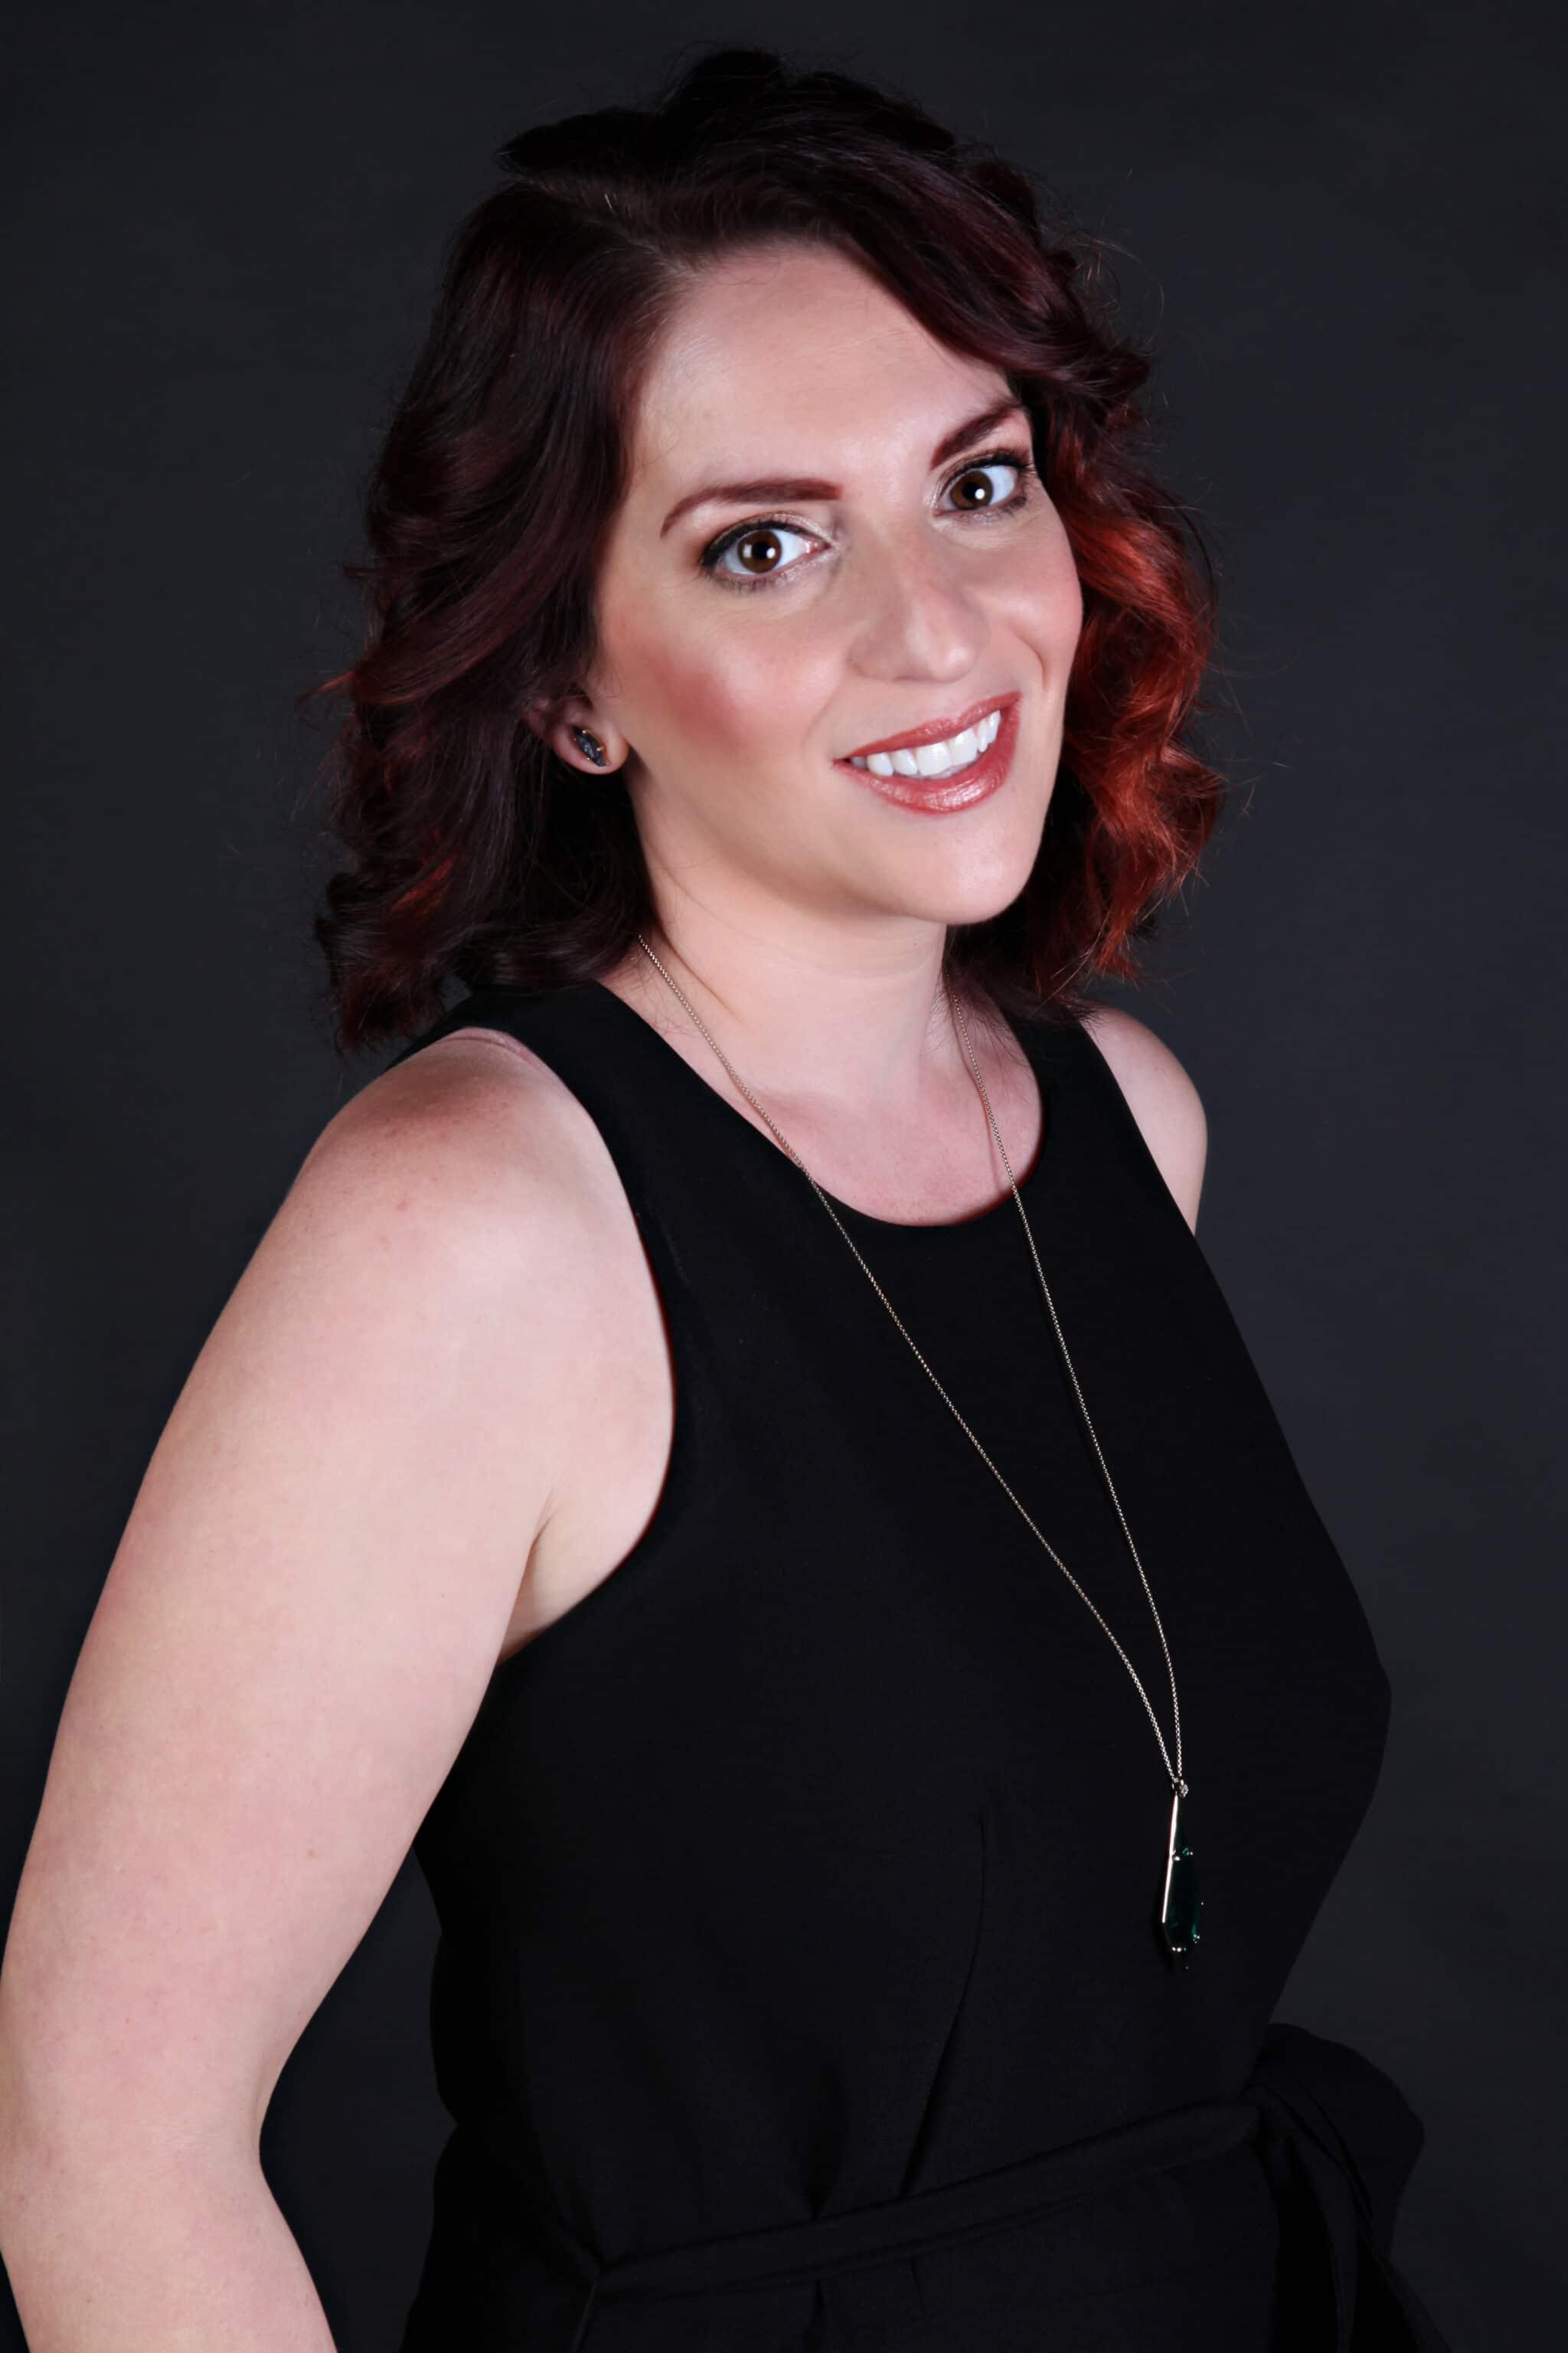 M3 Makeup Artist Services Orlando